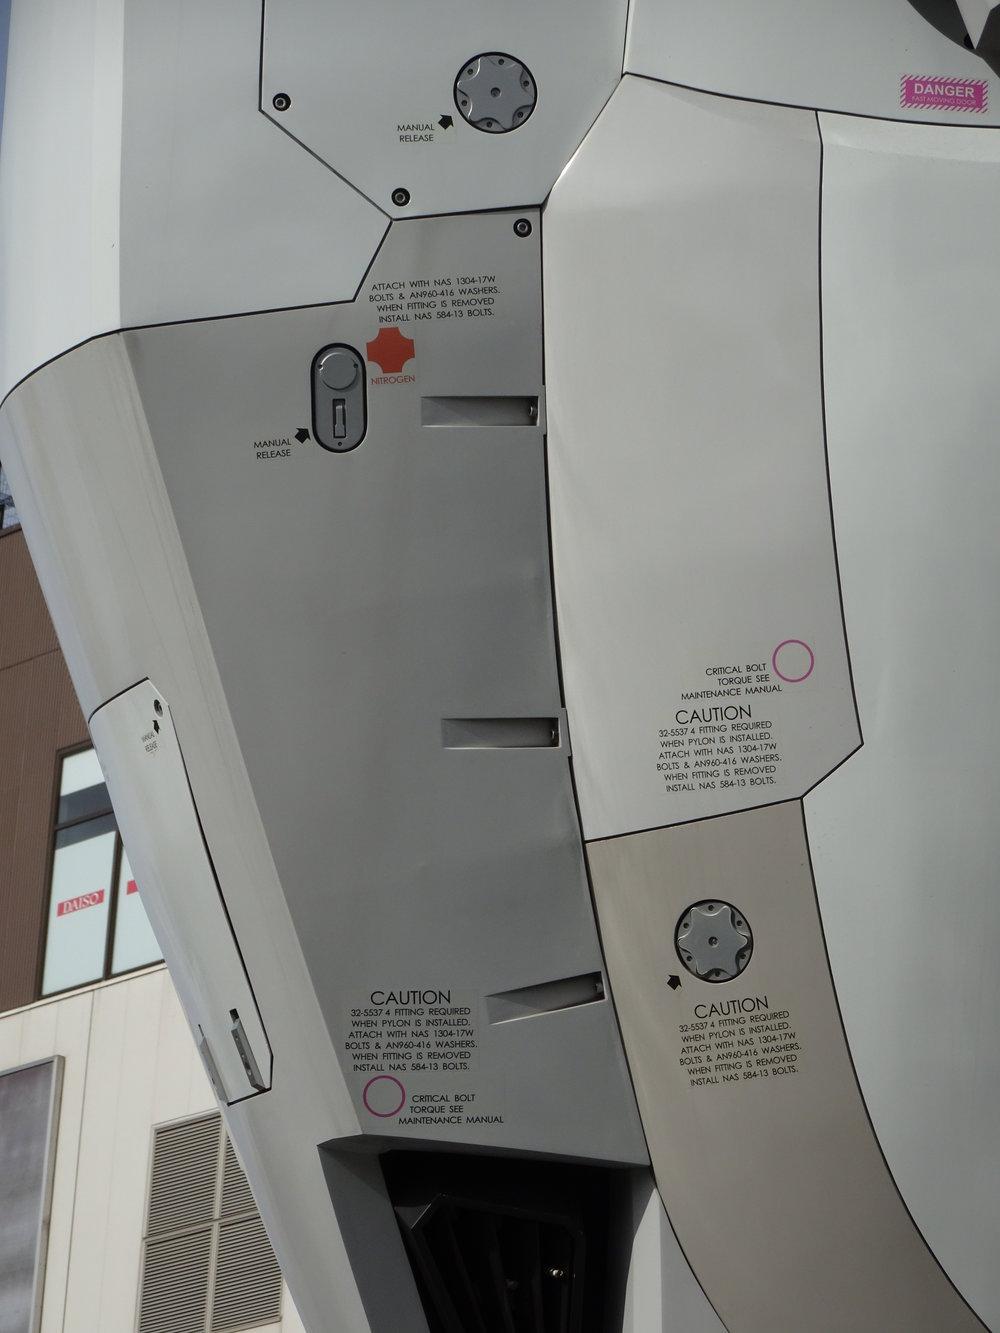 RX-78-2 Gundam 1-1 Statue - 095.jpg